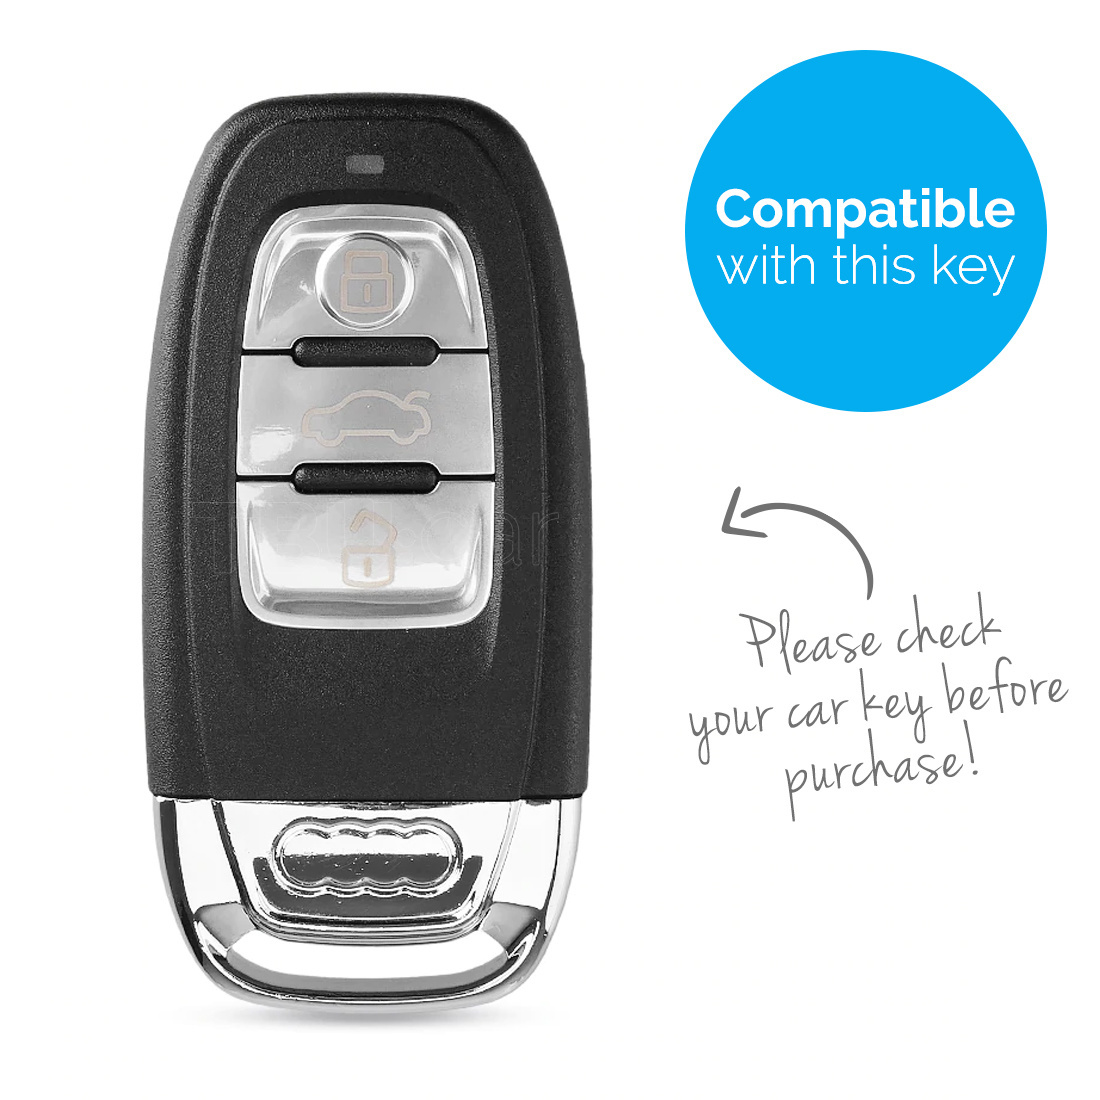 TBU car TBU car Autoschlüssel Hülle kompatibel mit Audi 3 Tasten (Keyless Entry) - Schutzhülle aus Silikon - Auto Schlüsselhülle Cover in Rosa